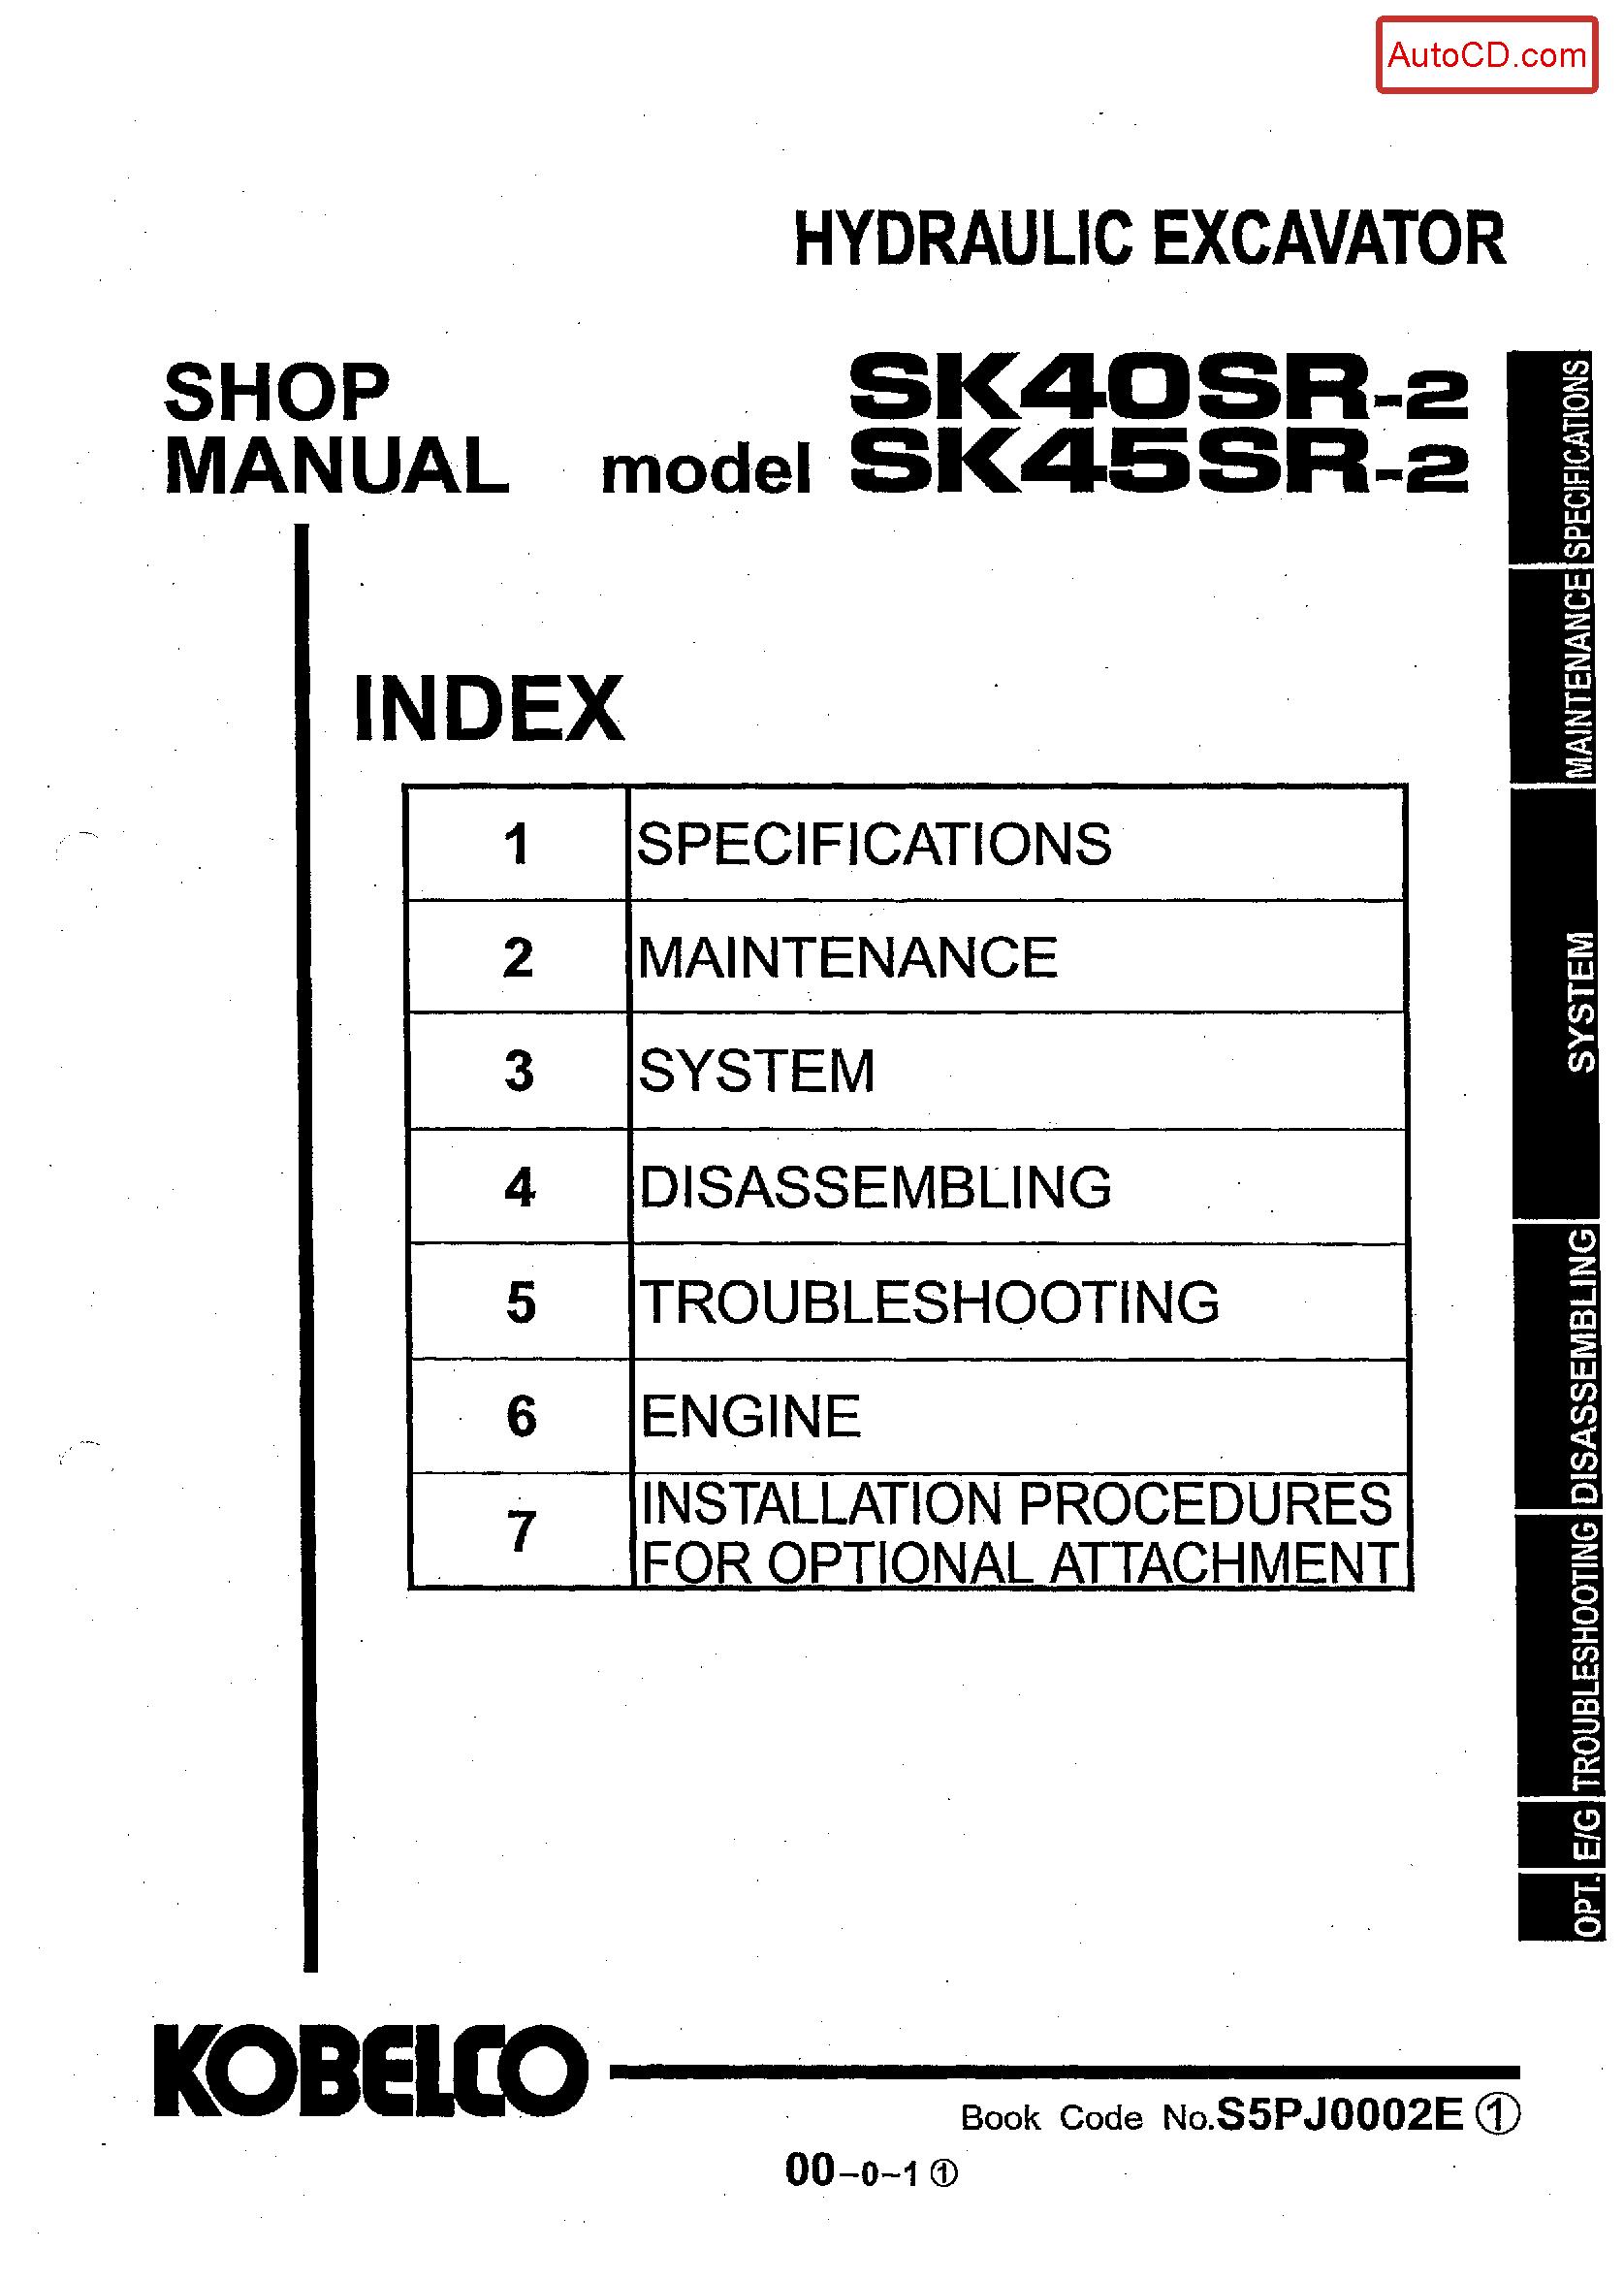 Kobelco Sk40sr 2 Manual In 2020 Hydraulic Excavator Excavator Repair Manuals